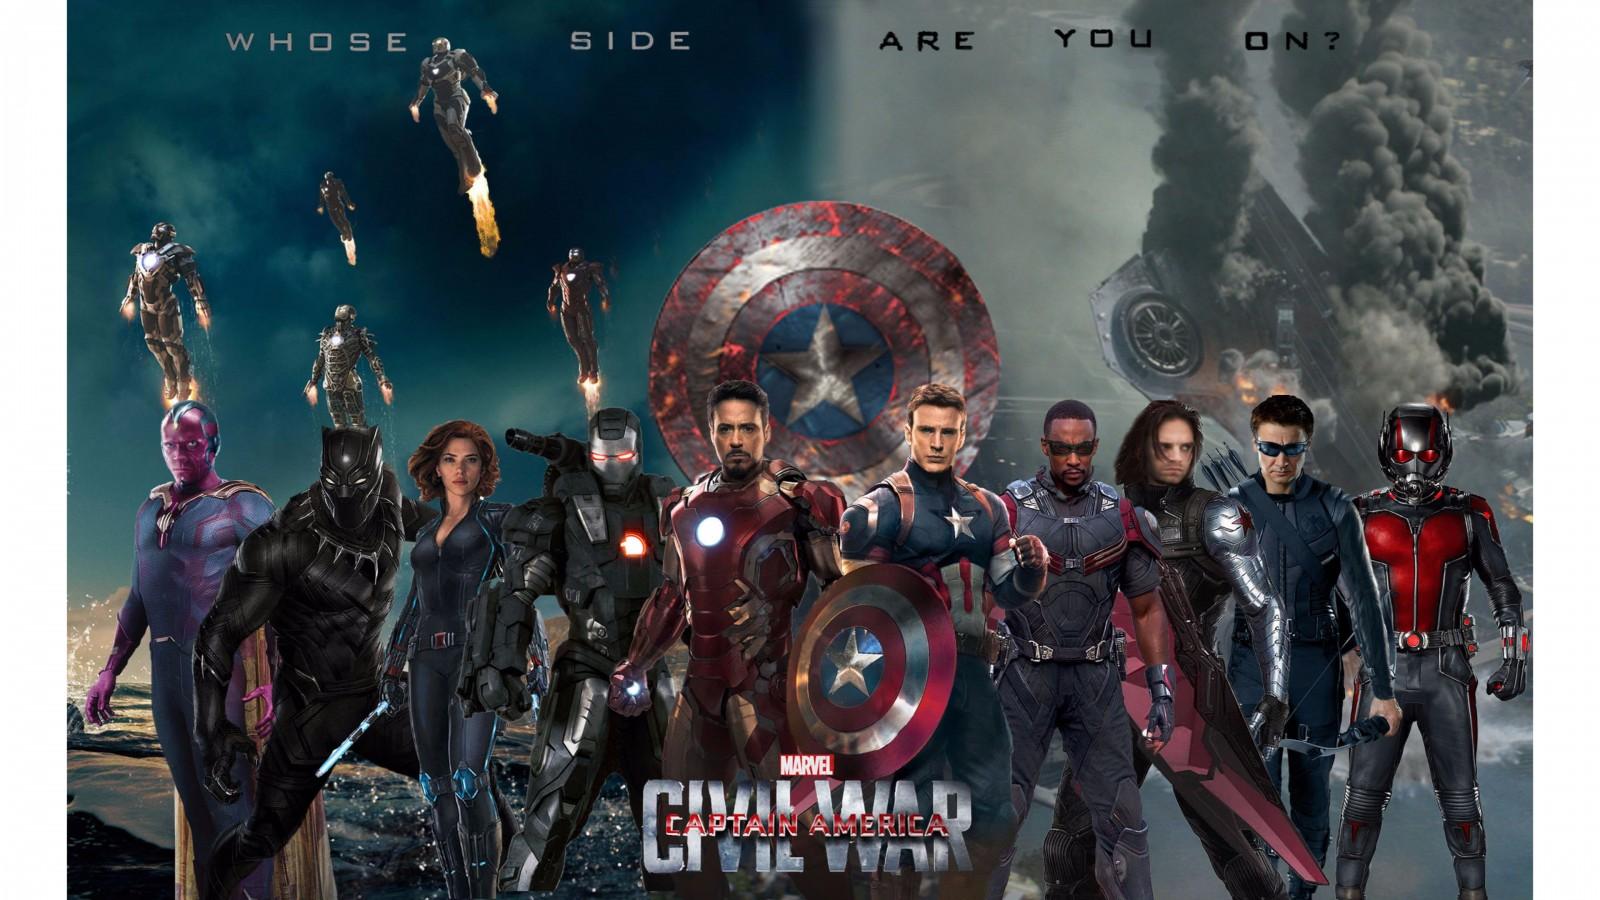 2016 Captain America Civil War 4K Wallpaper 4K 1600x900